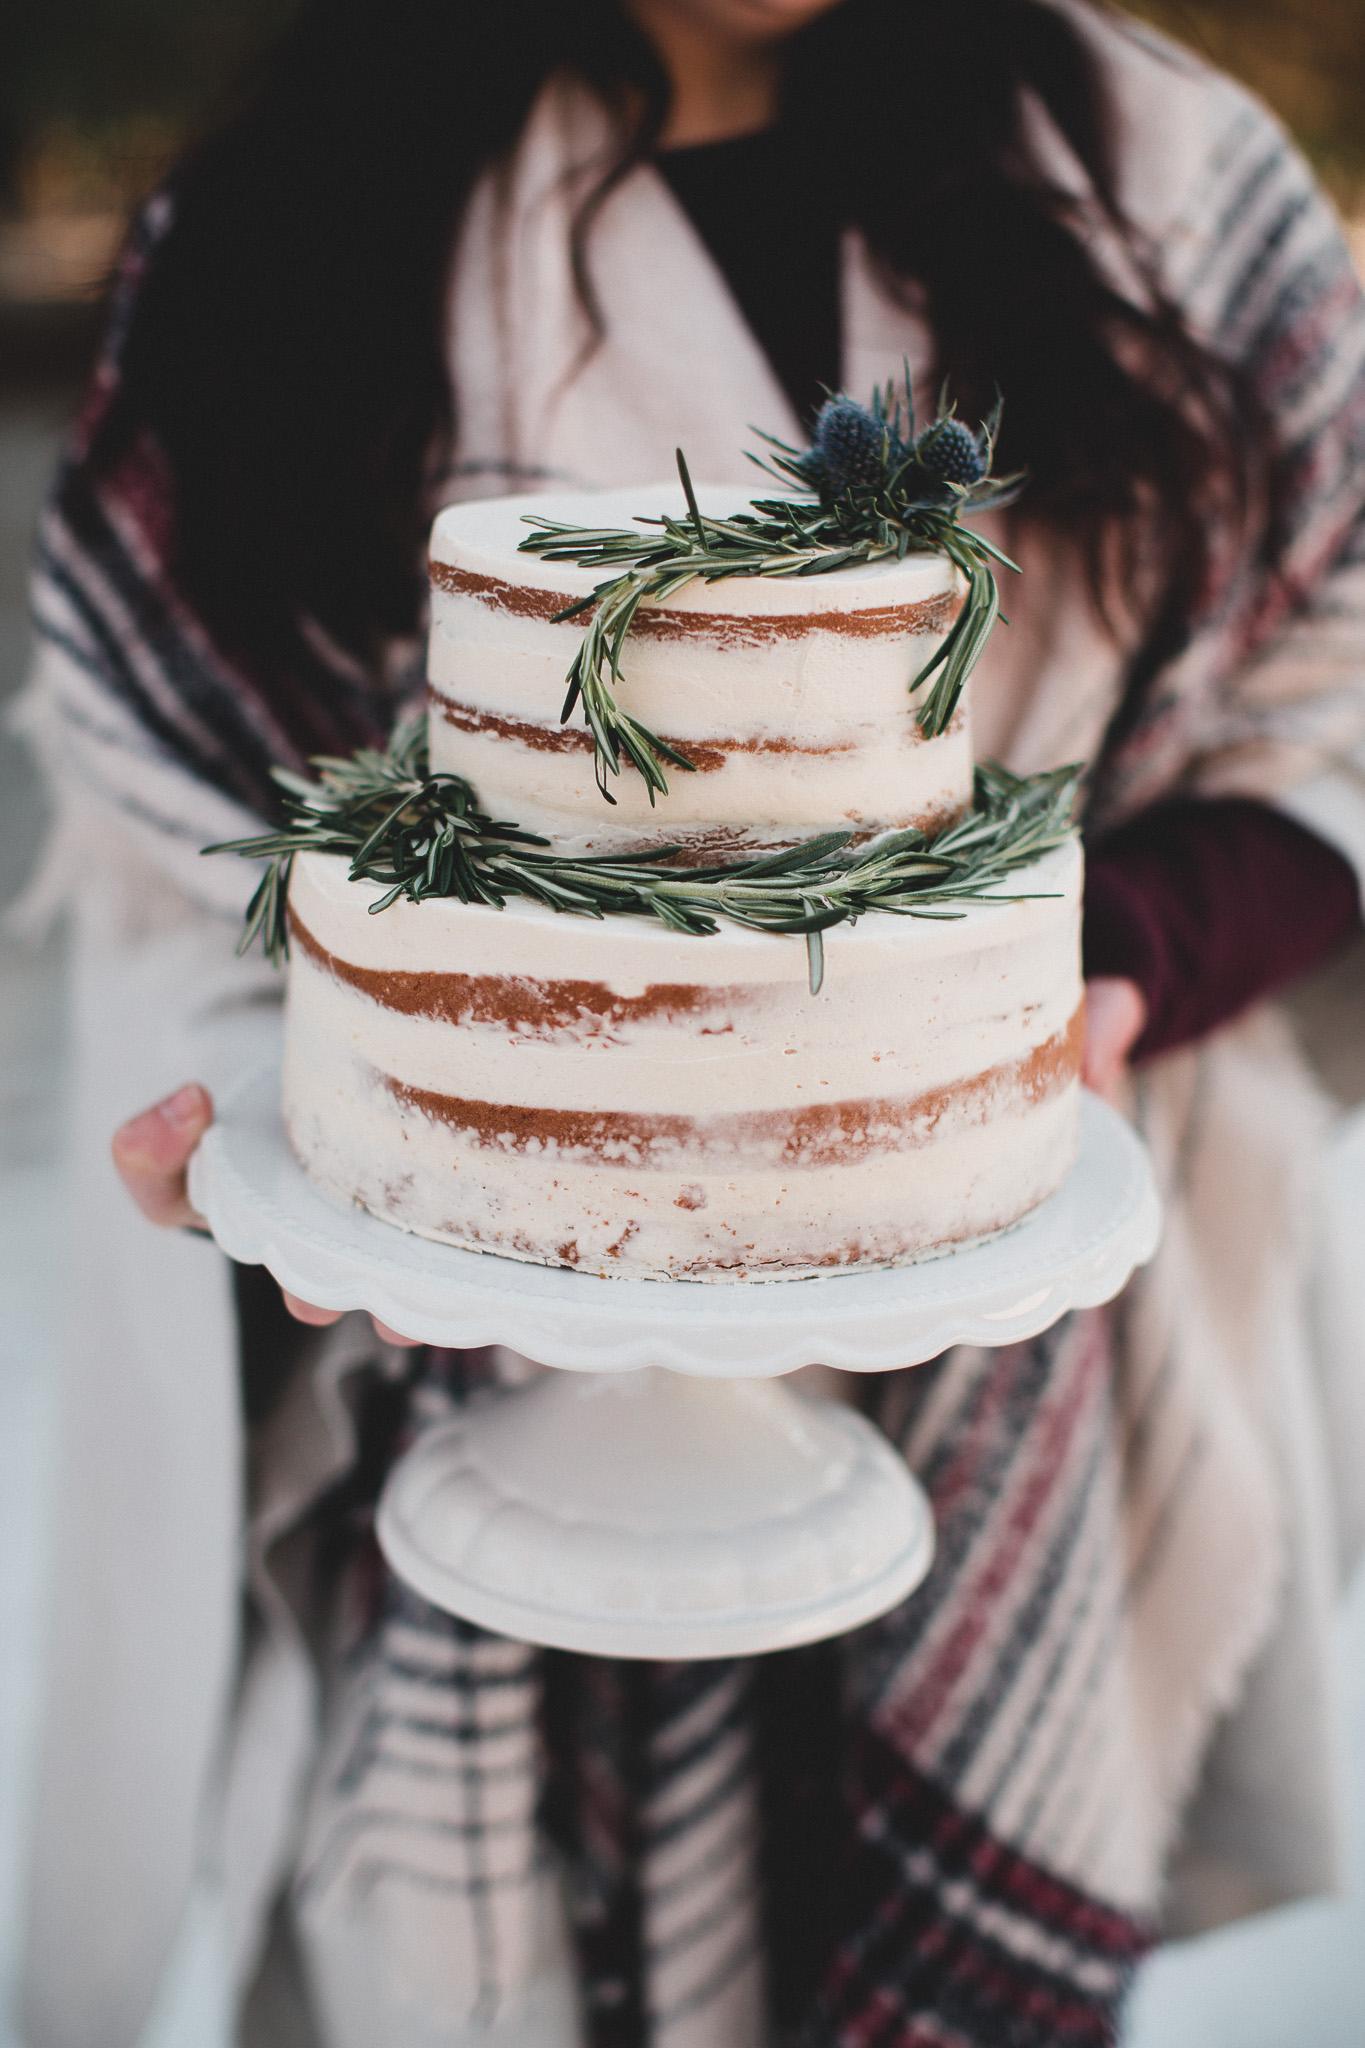 The Sugar Lab Ottawa Cake and Desserts